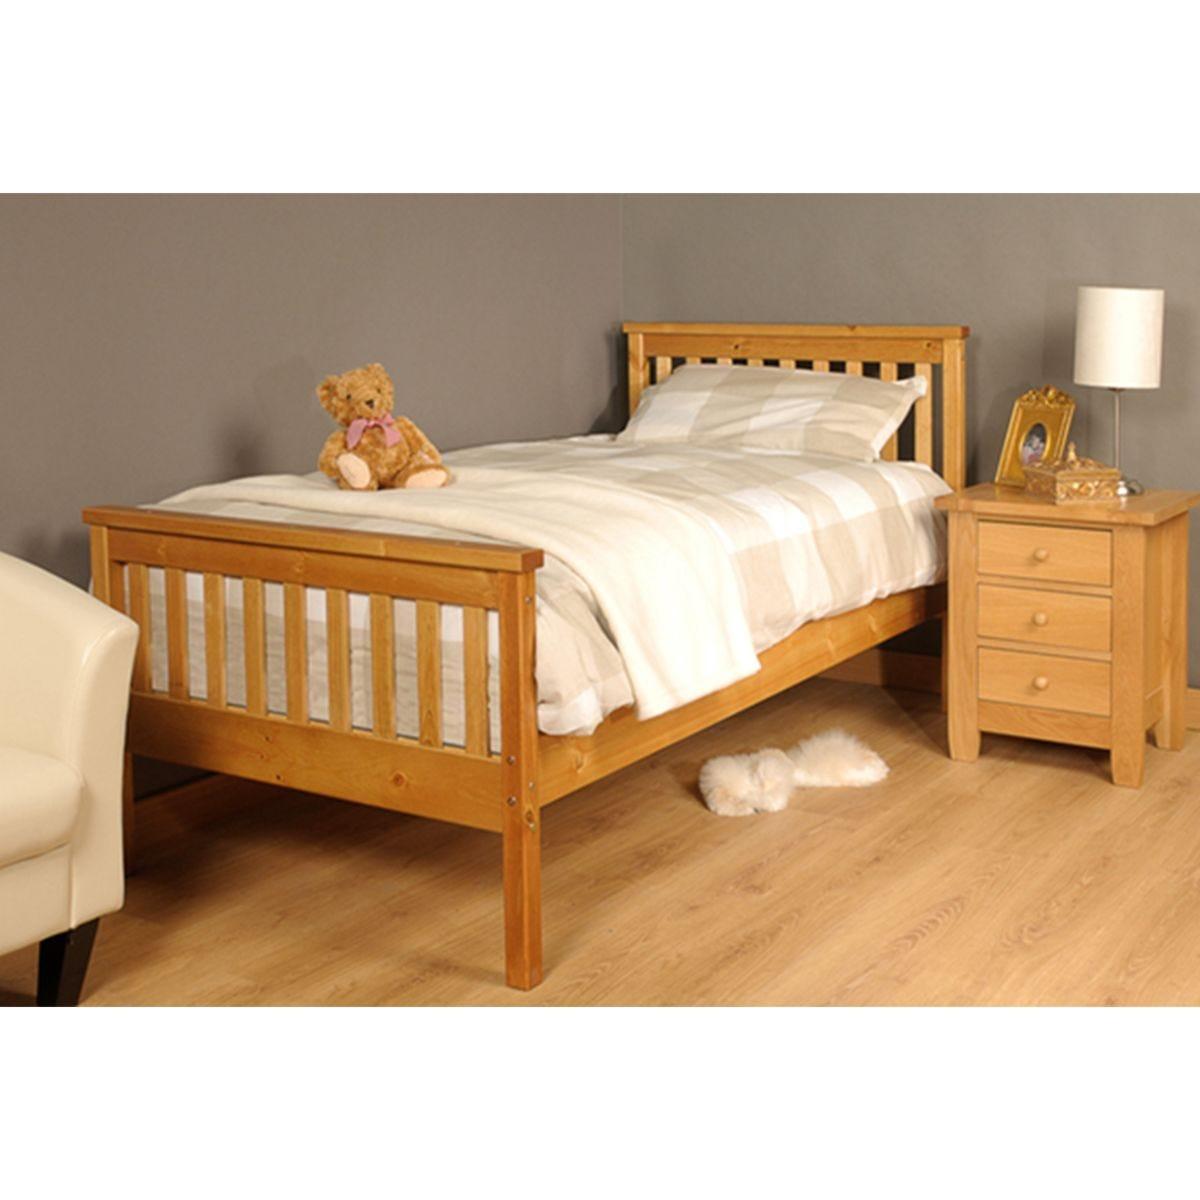 Talsi Bed Frame - Caramel